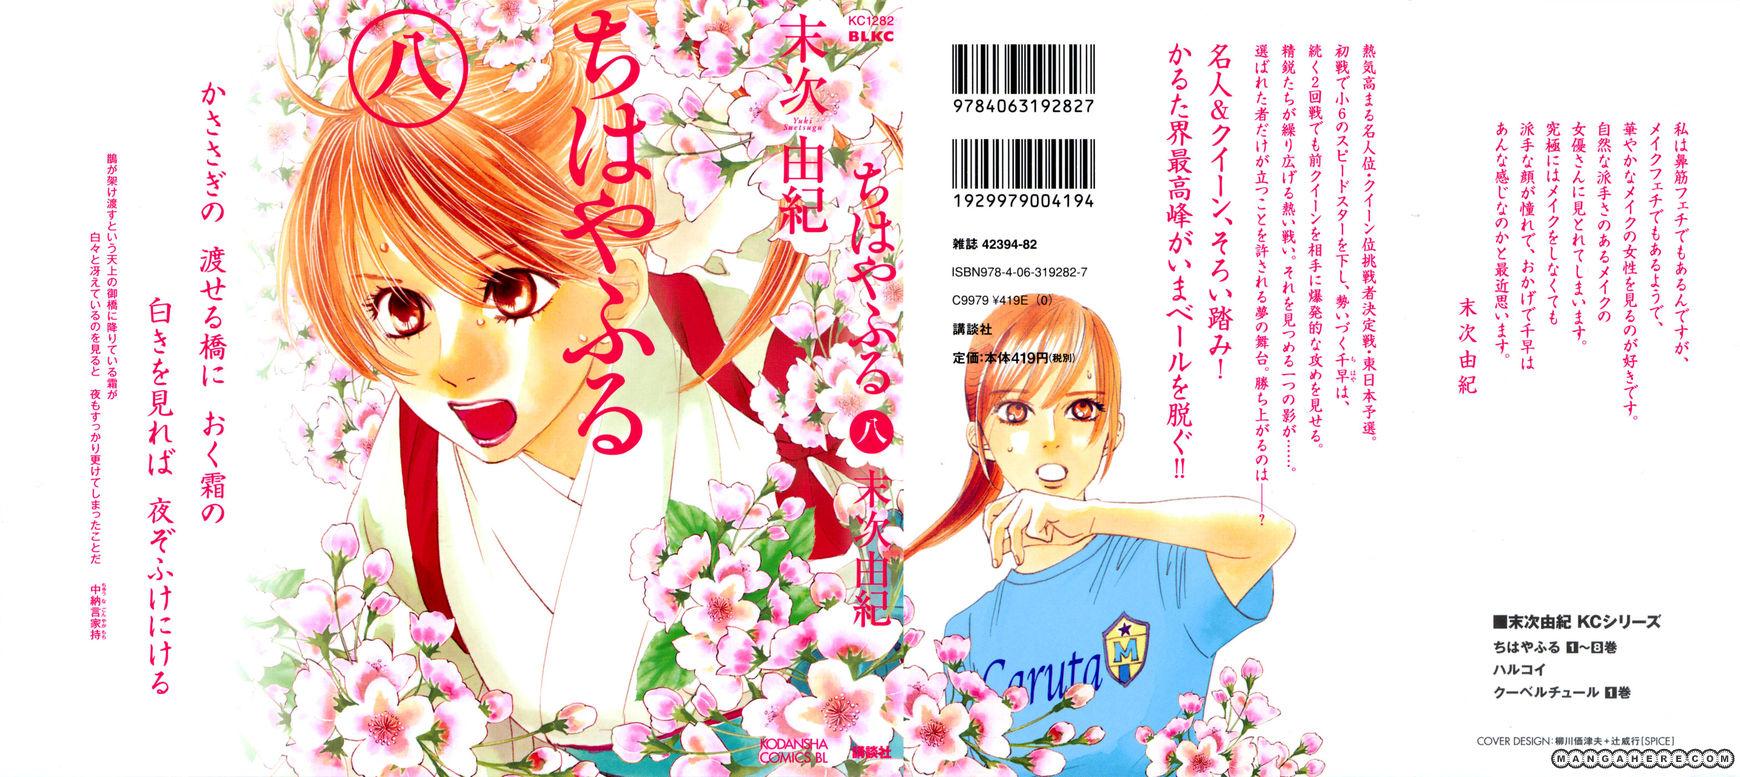 Chihayafuru 42 Page 5